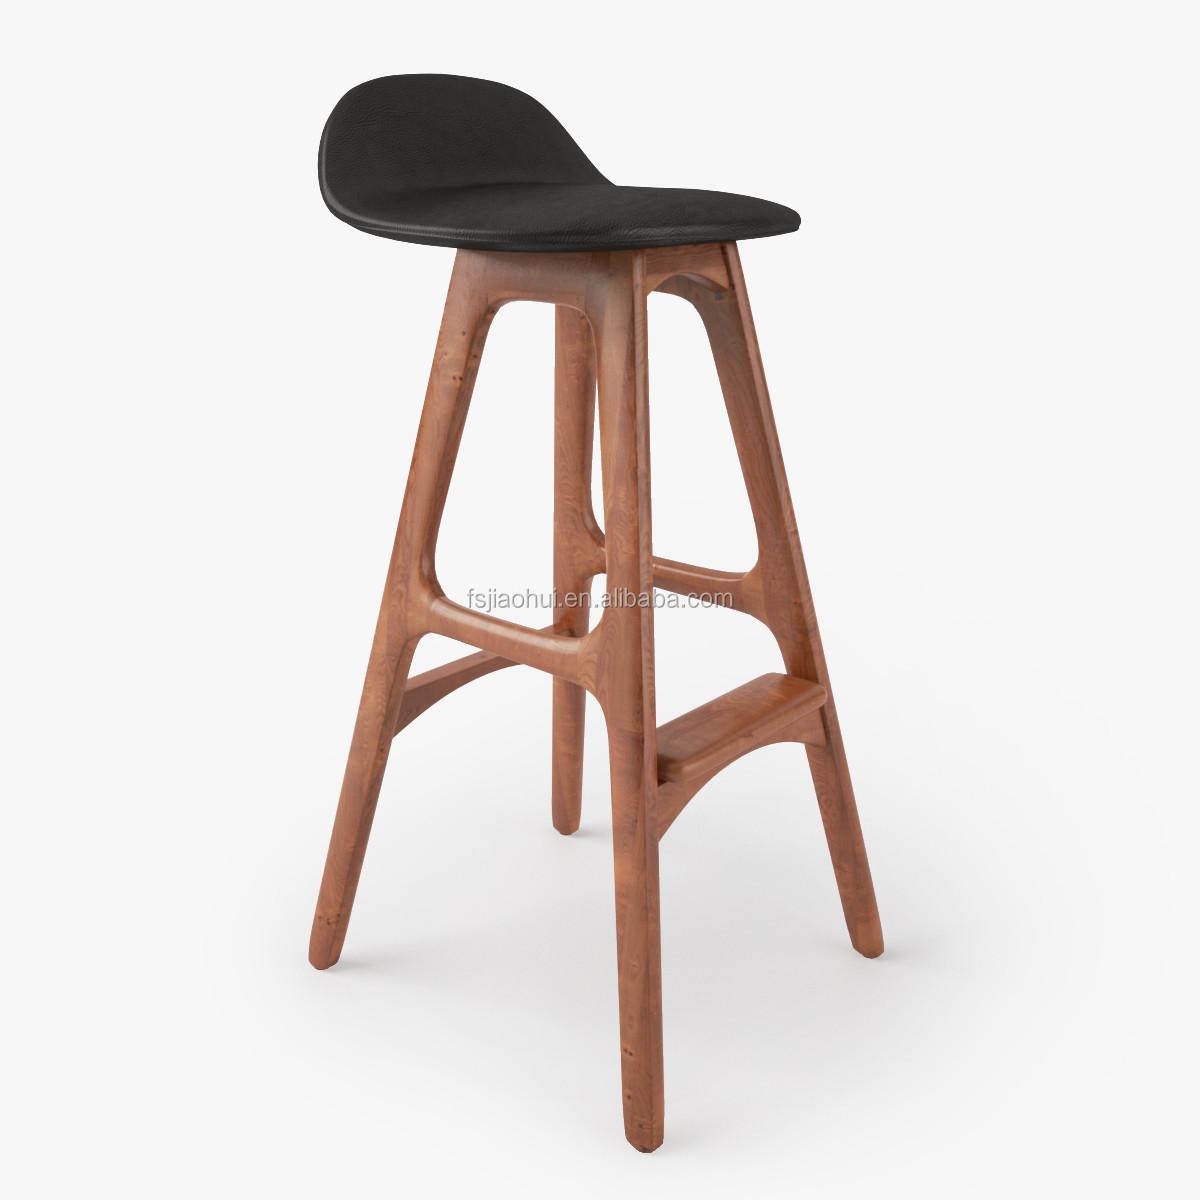 Hammock Chair Revit